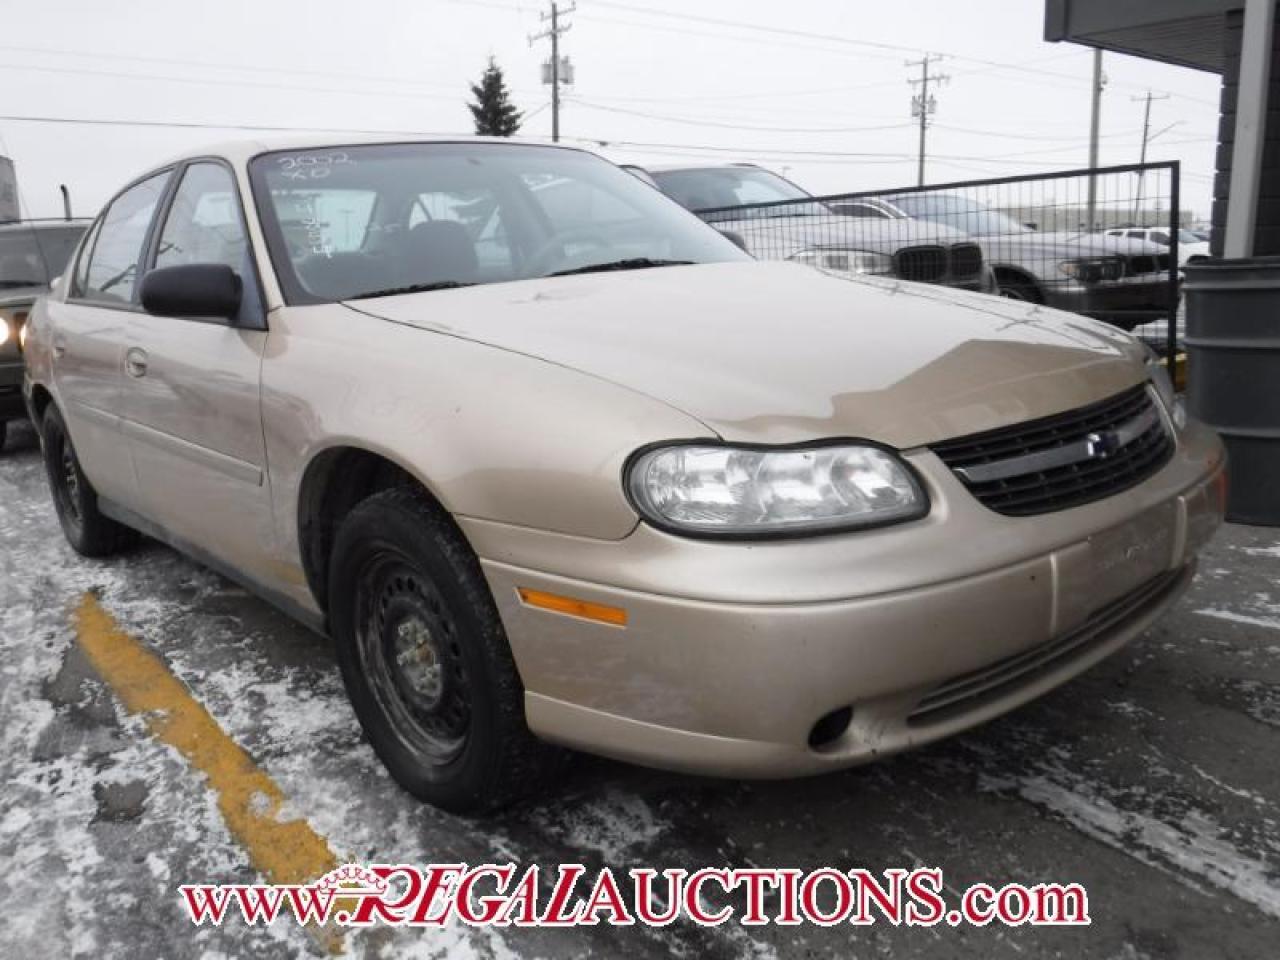 Photo of Tan 2002 Chevrolet MALIBU BASE 4D SEDAN